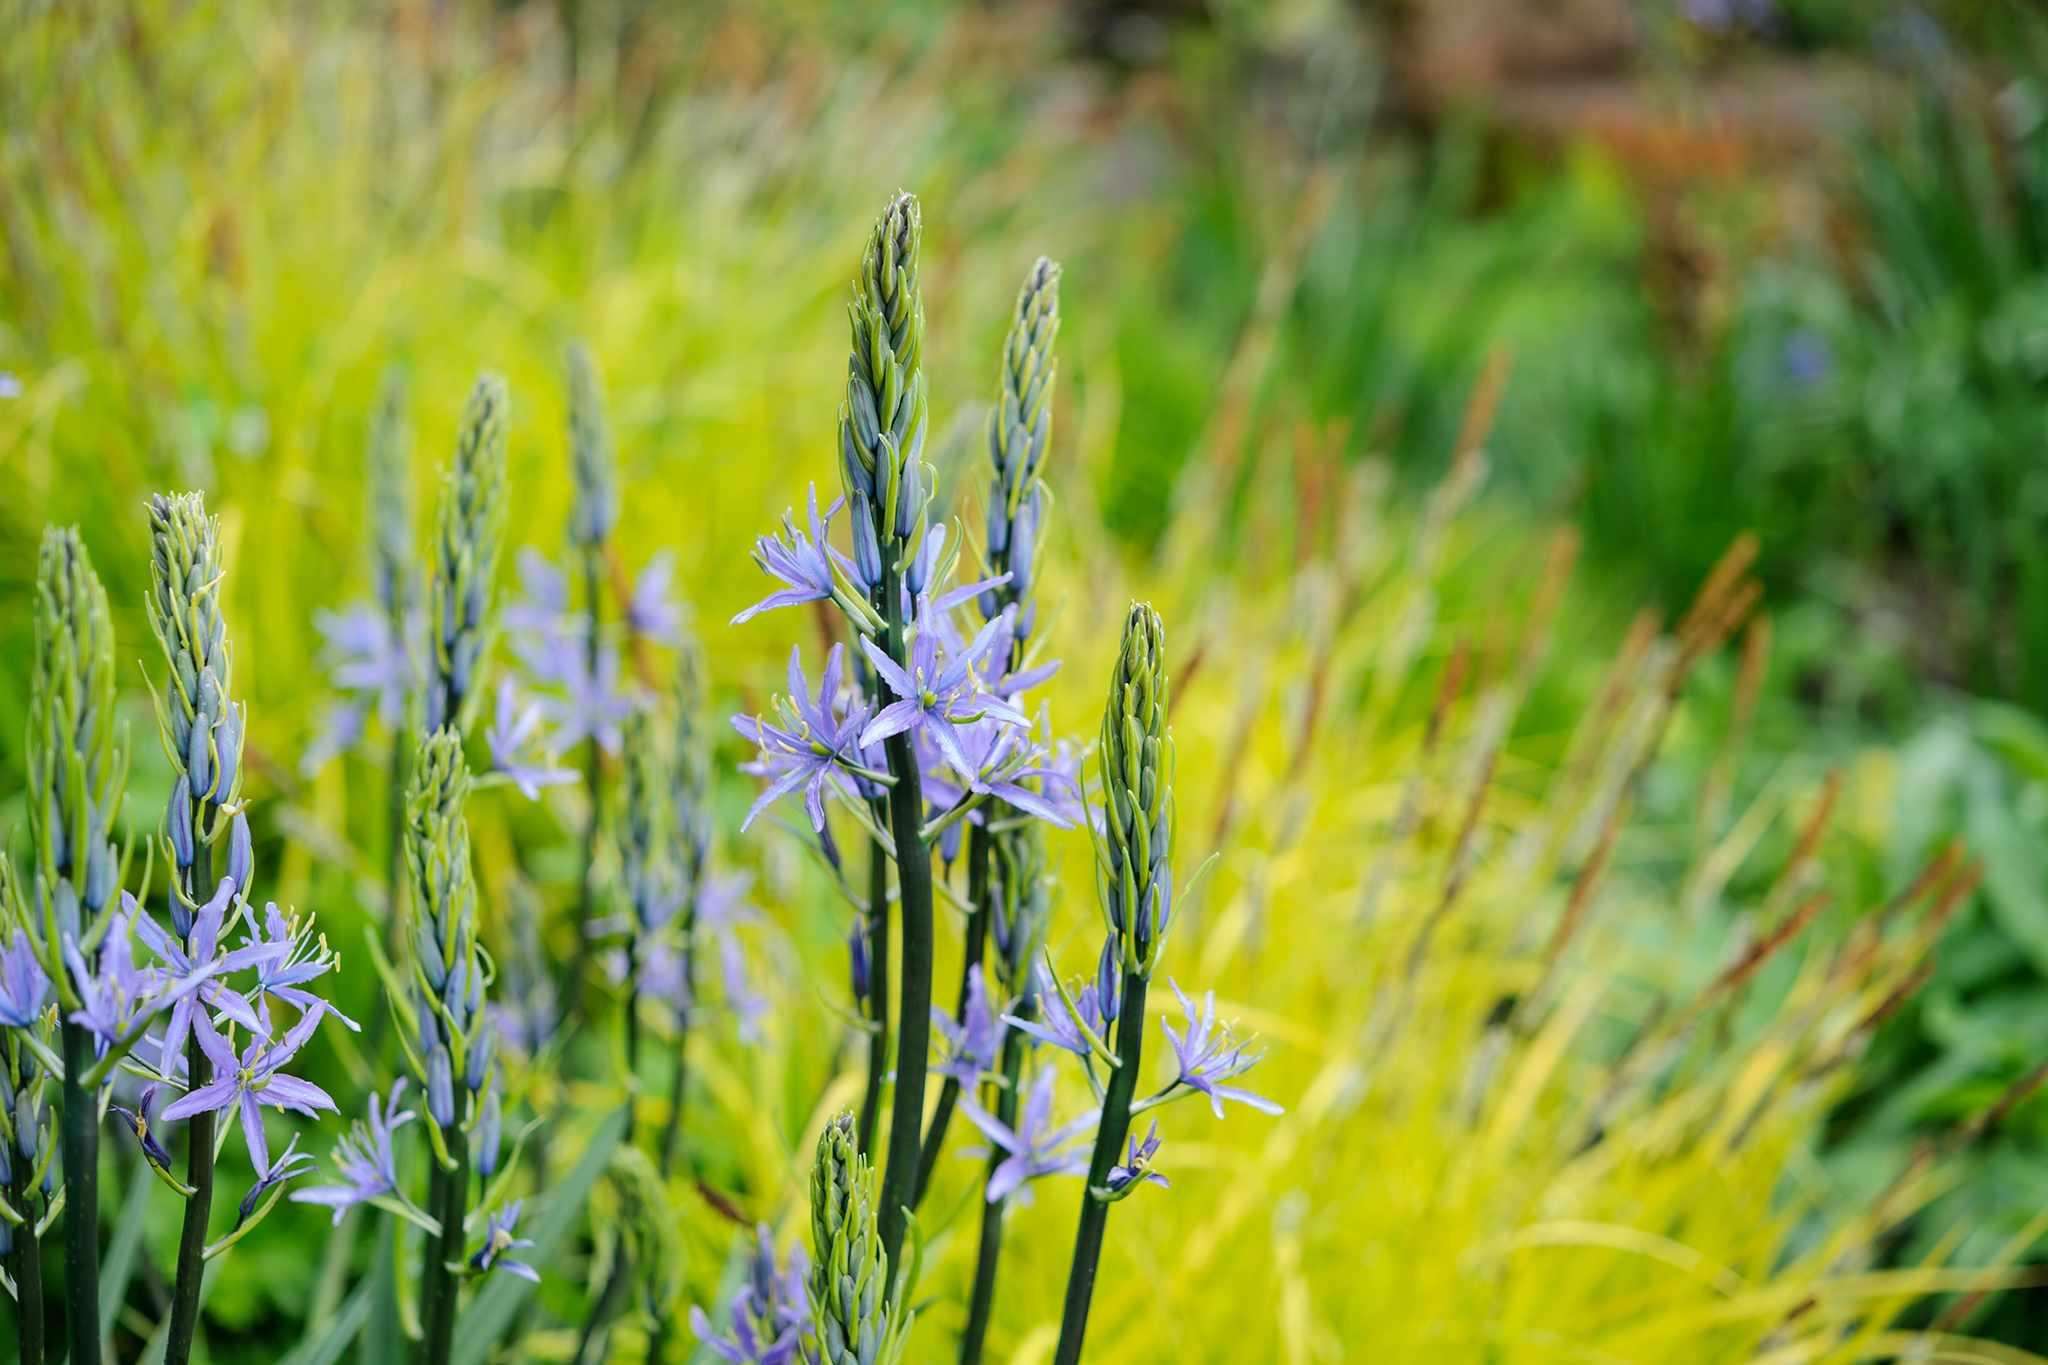 Blue camassia flowers